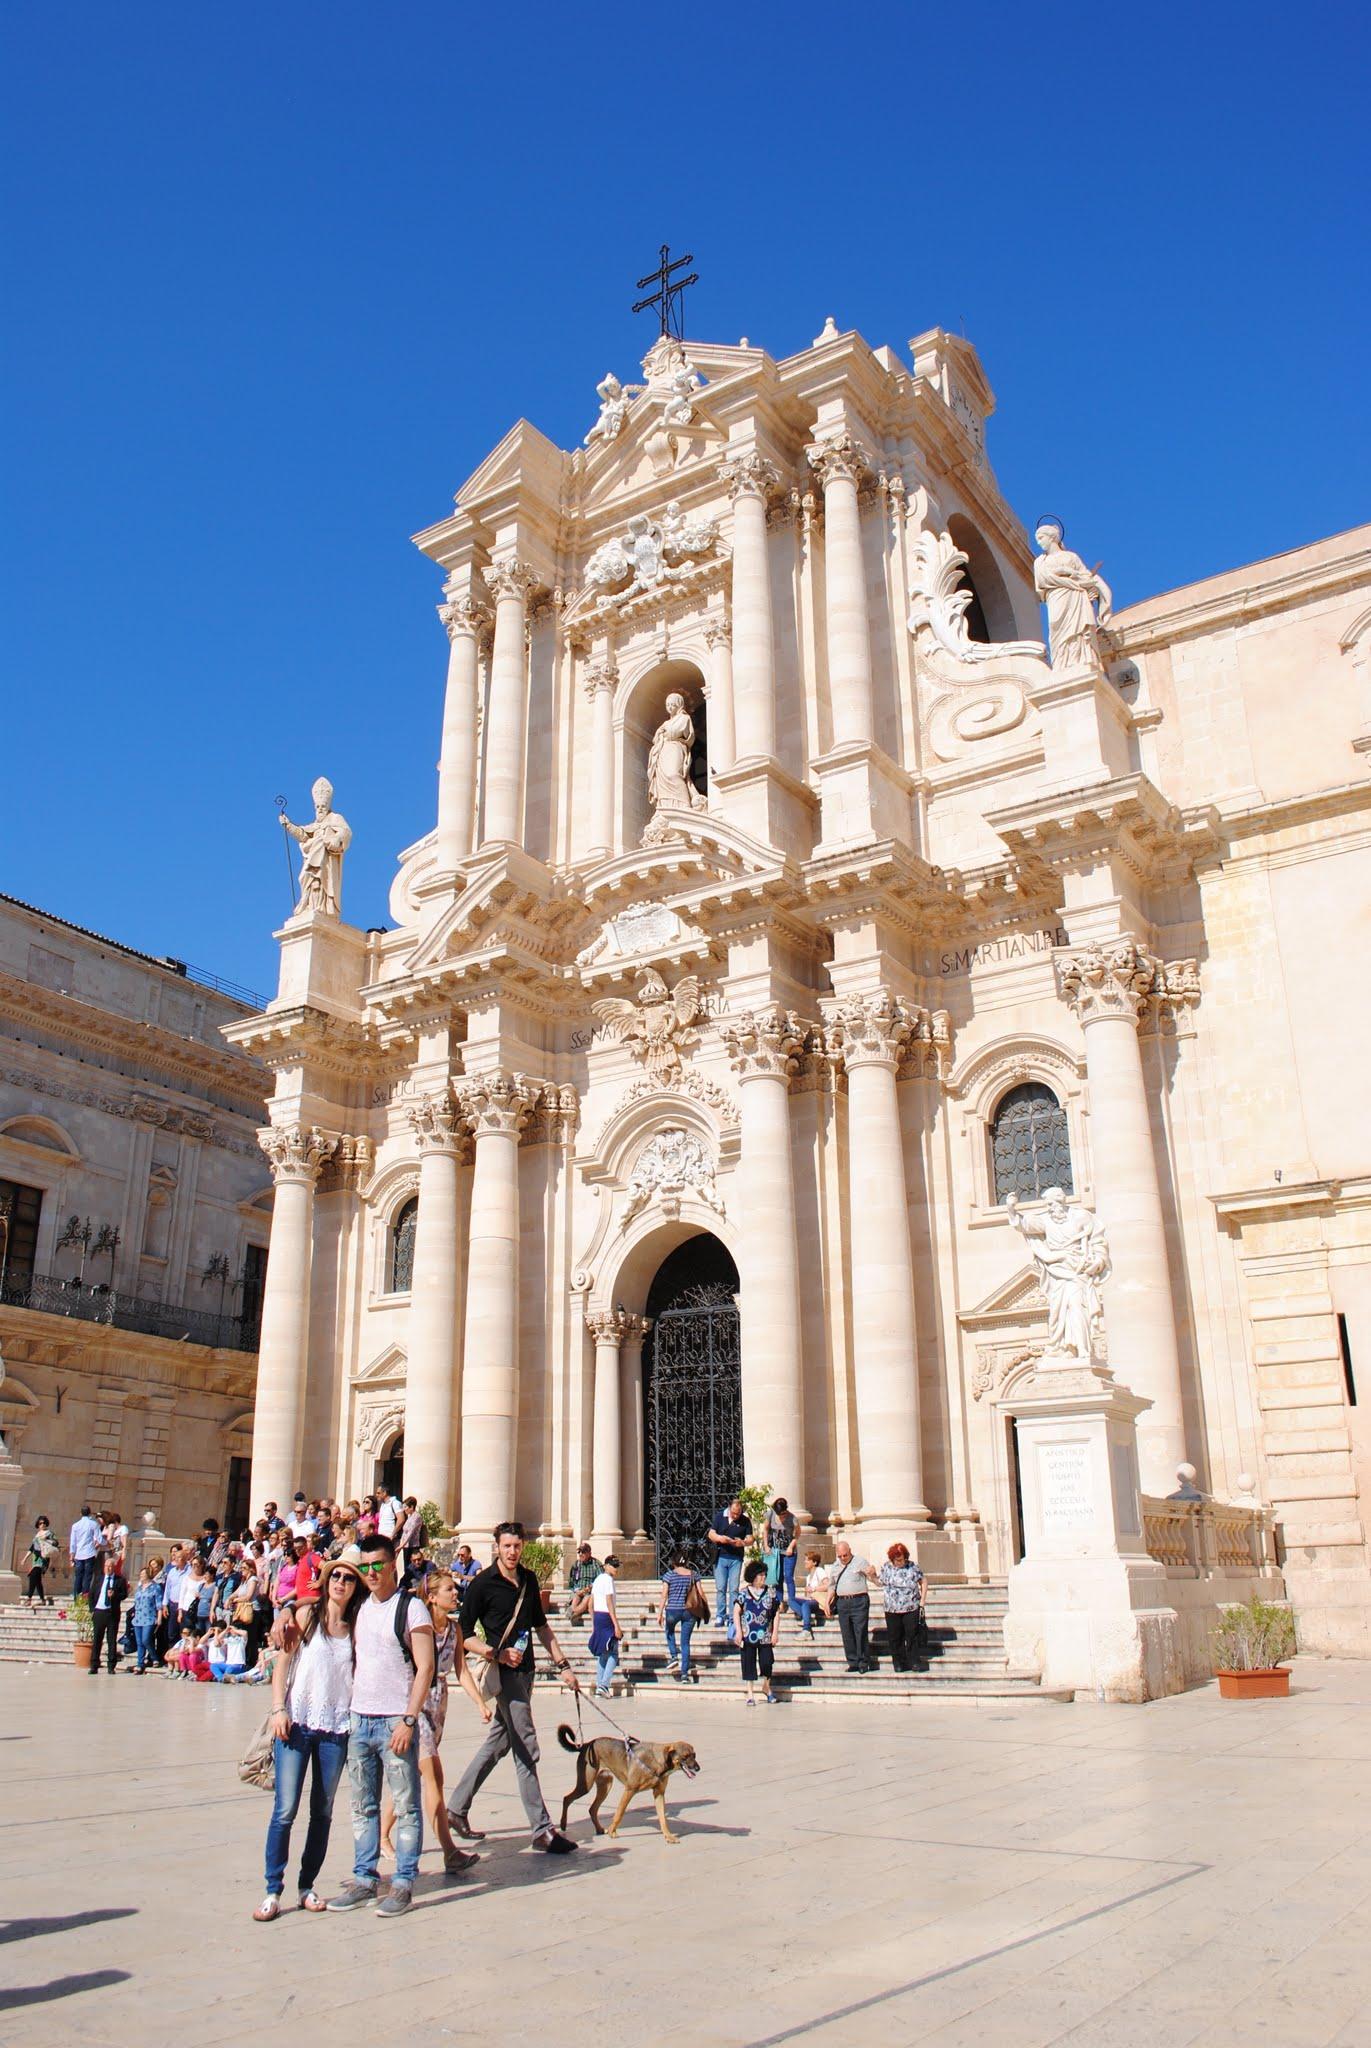 My Photos: Italy -- Sicily -- Siracusa -- Duomo and Piazza